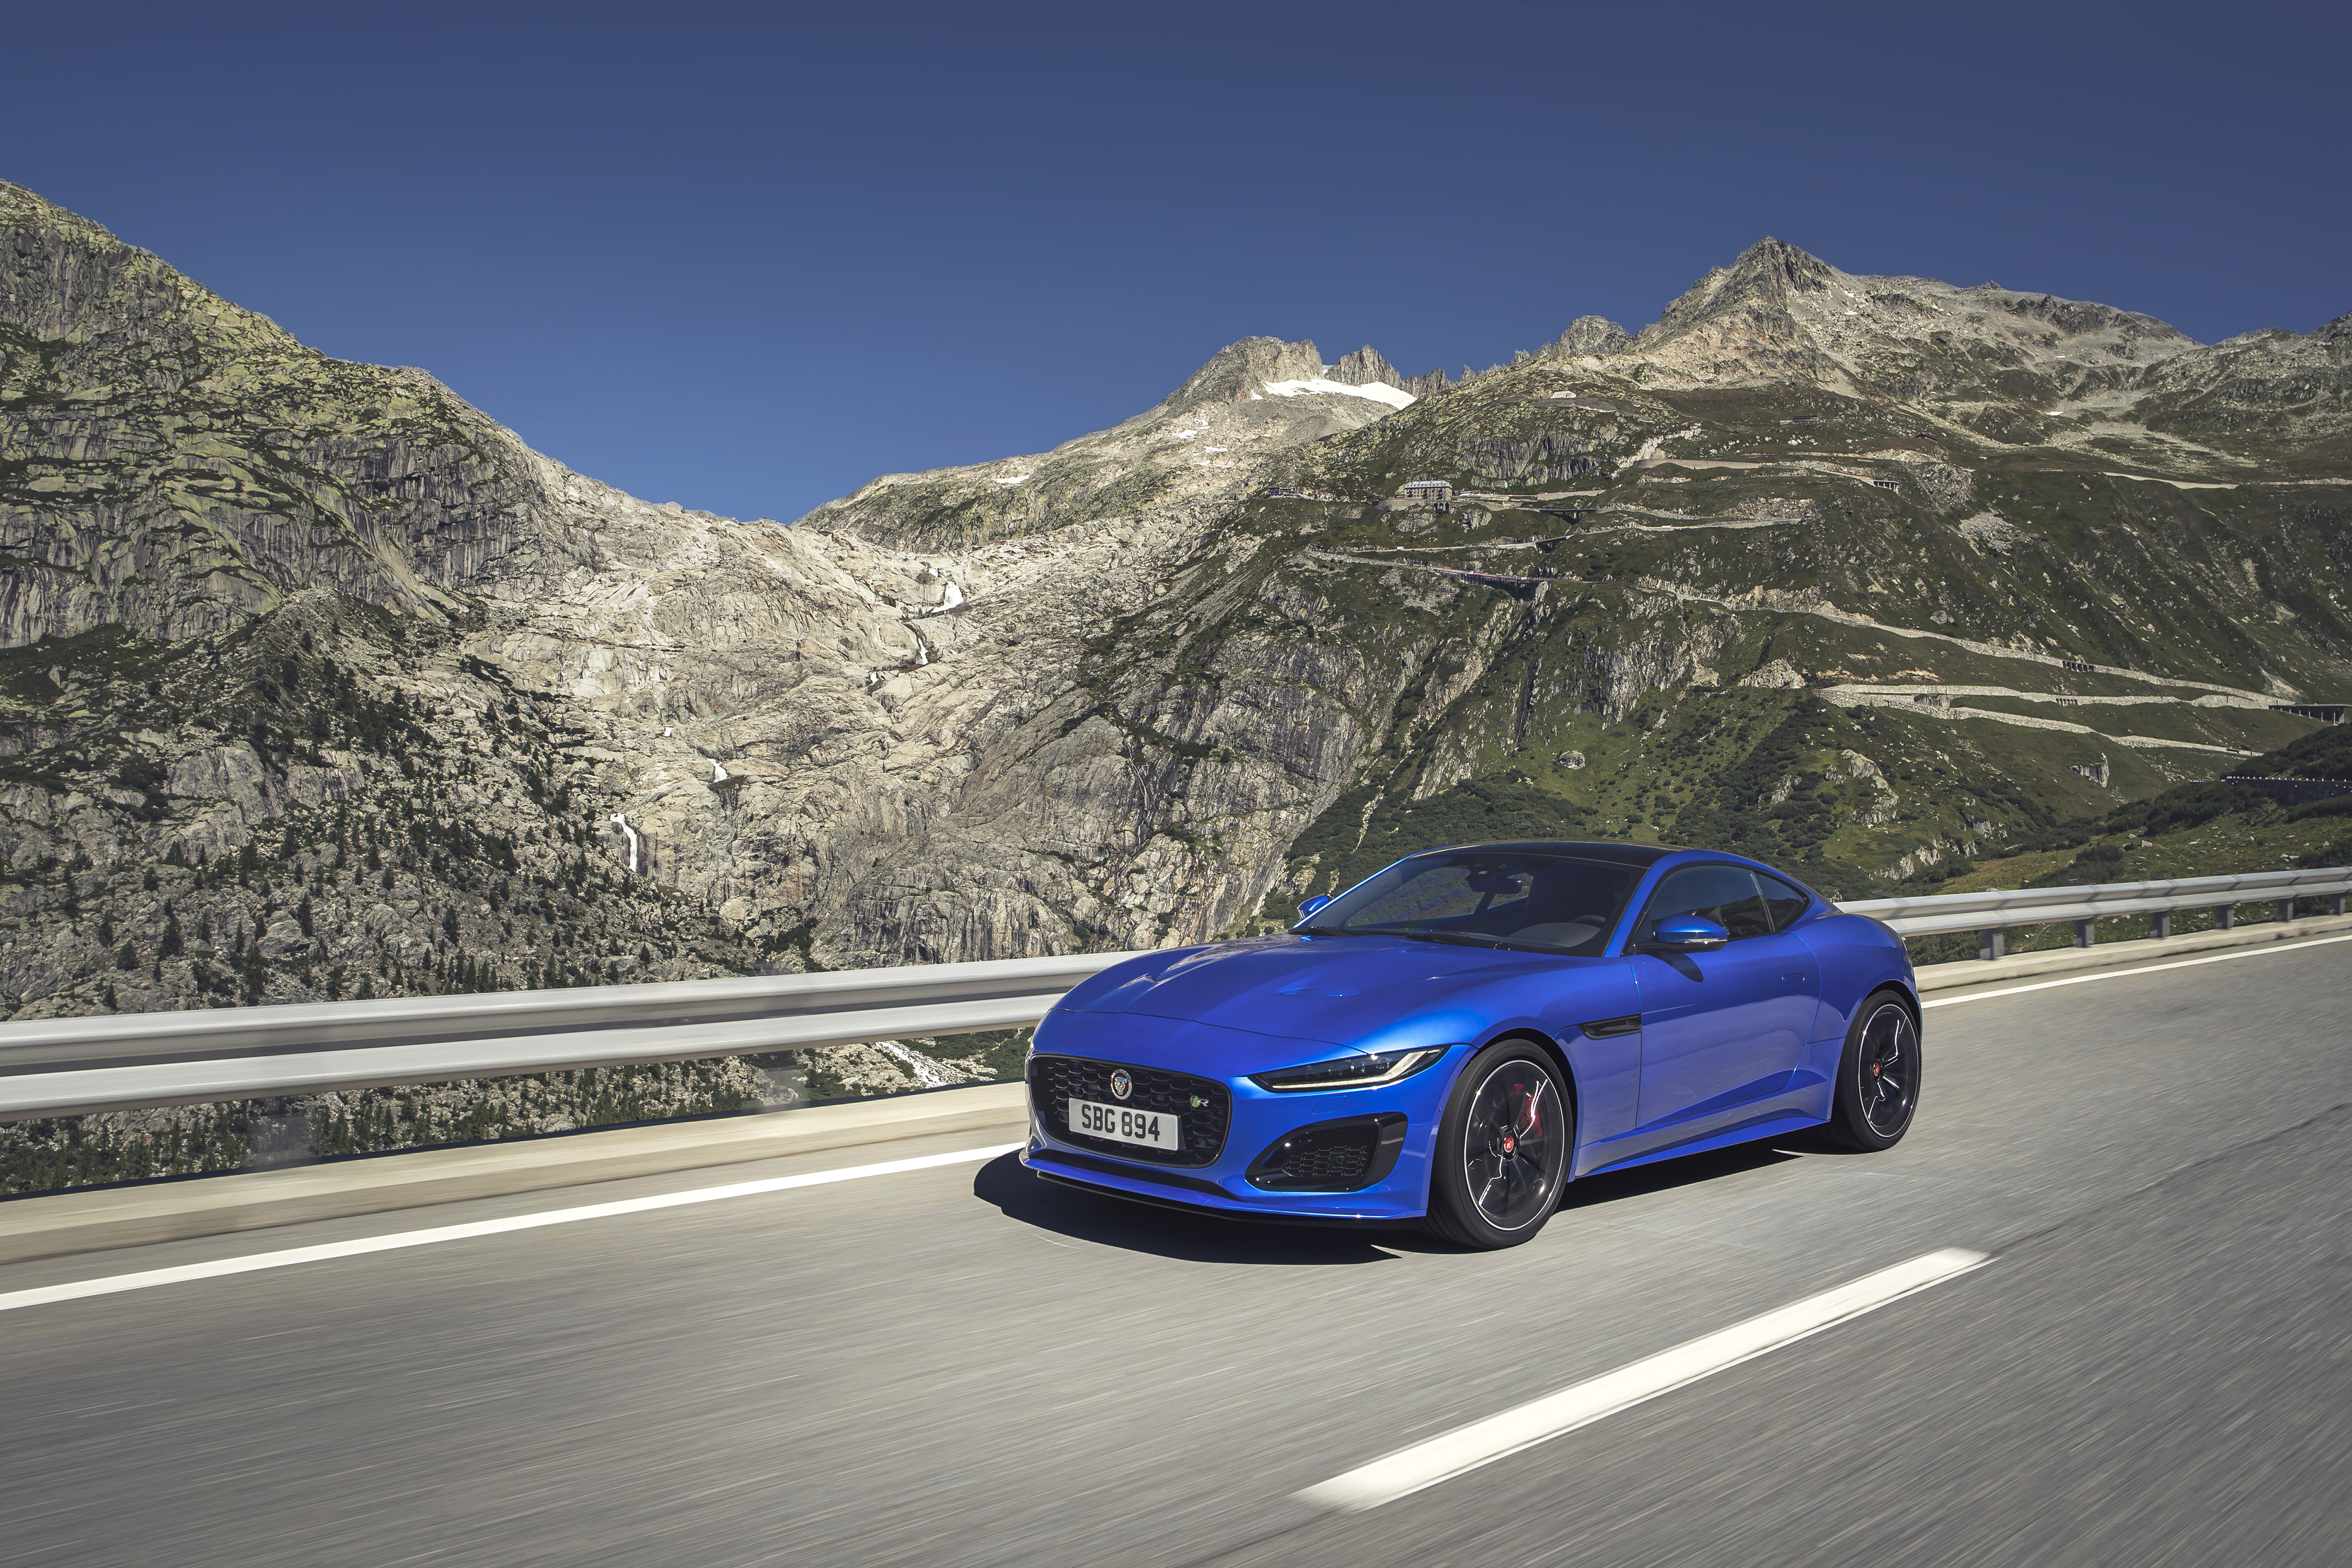 339255 07 jag f type r 21my velocity blue reveal switzerland 021219 05 28f35a original 1574864957